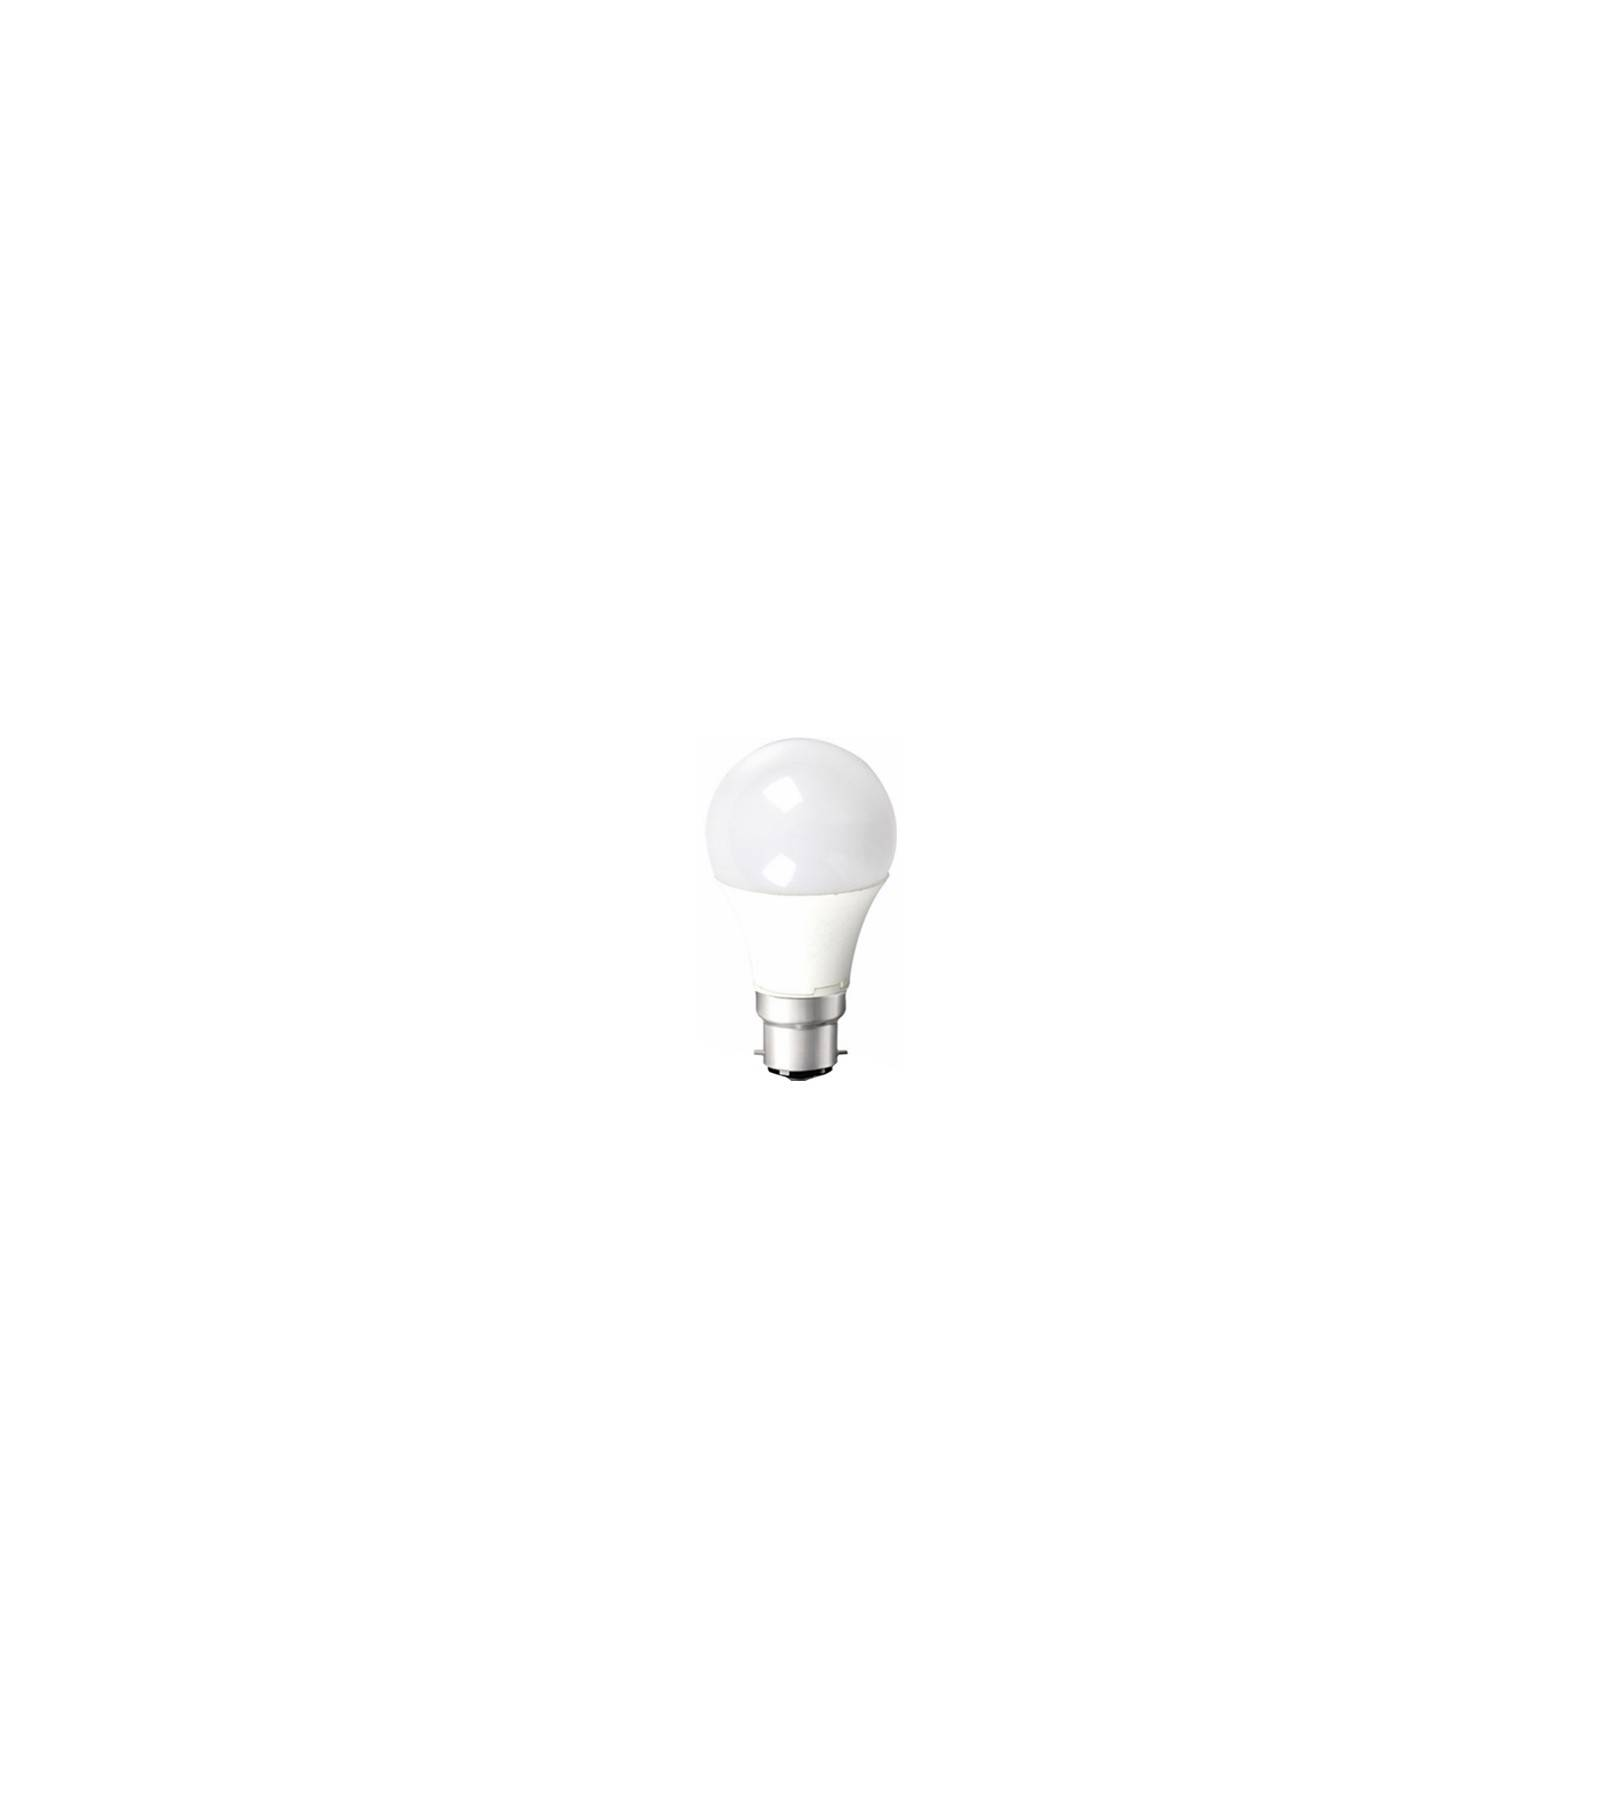 V-TAC Ampoule LED SMD 220V Culot B22 12W rendu 10W équivalent 60W Blanc chaud 3000K A60 ref 4442 V-TAC - 4442